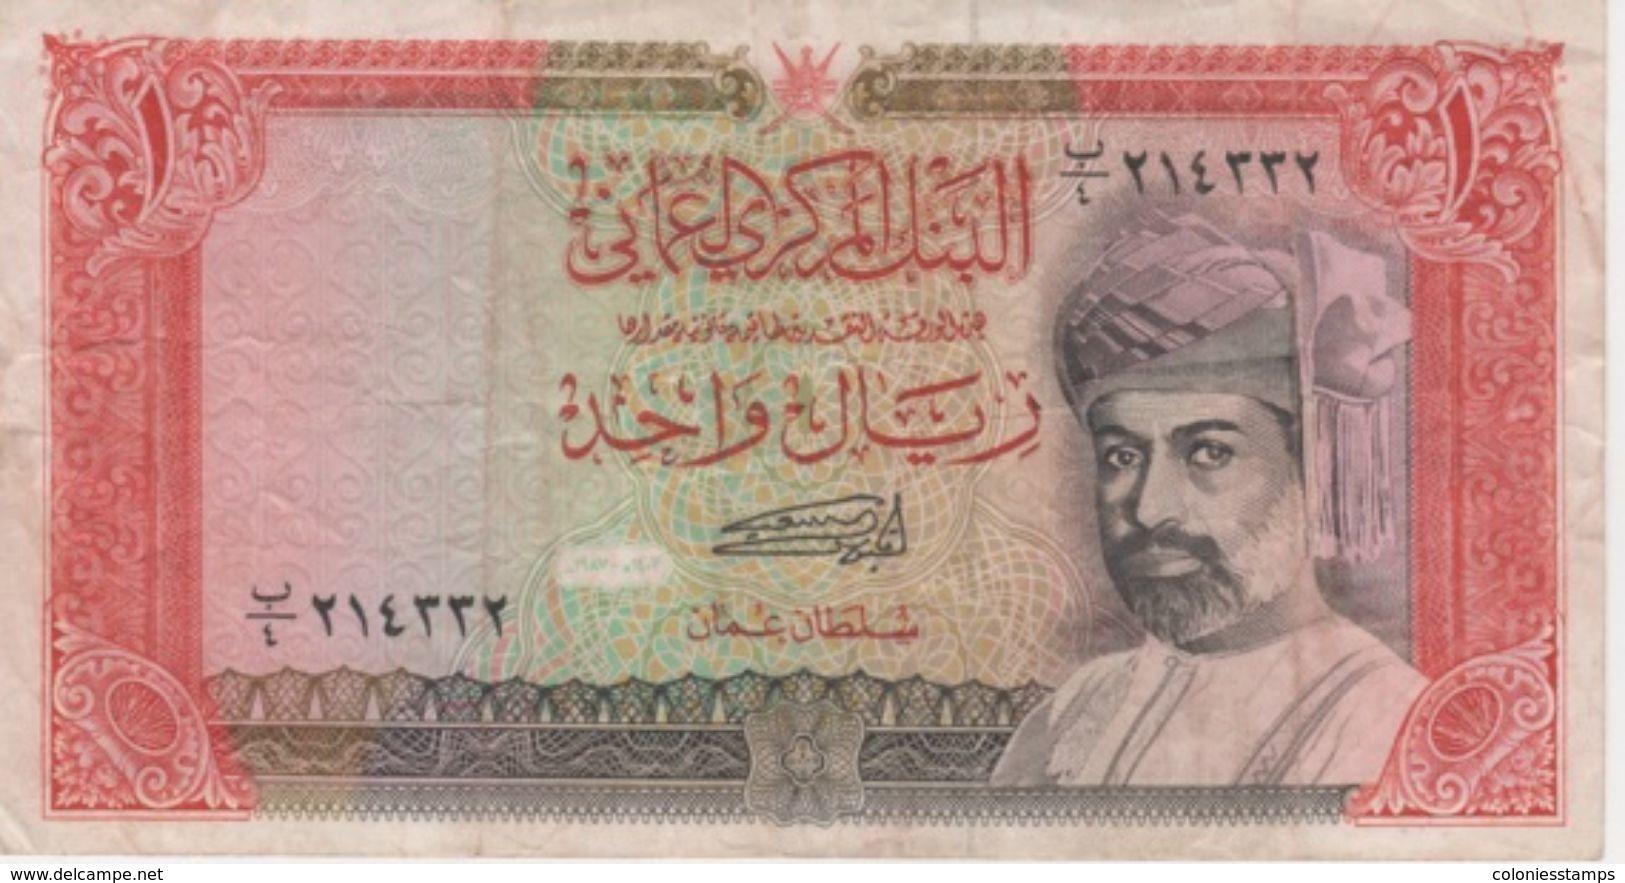 (B0195) OMAN, 1987. 1 Rial. P-26a. VG - Oman